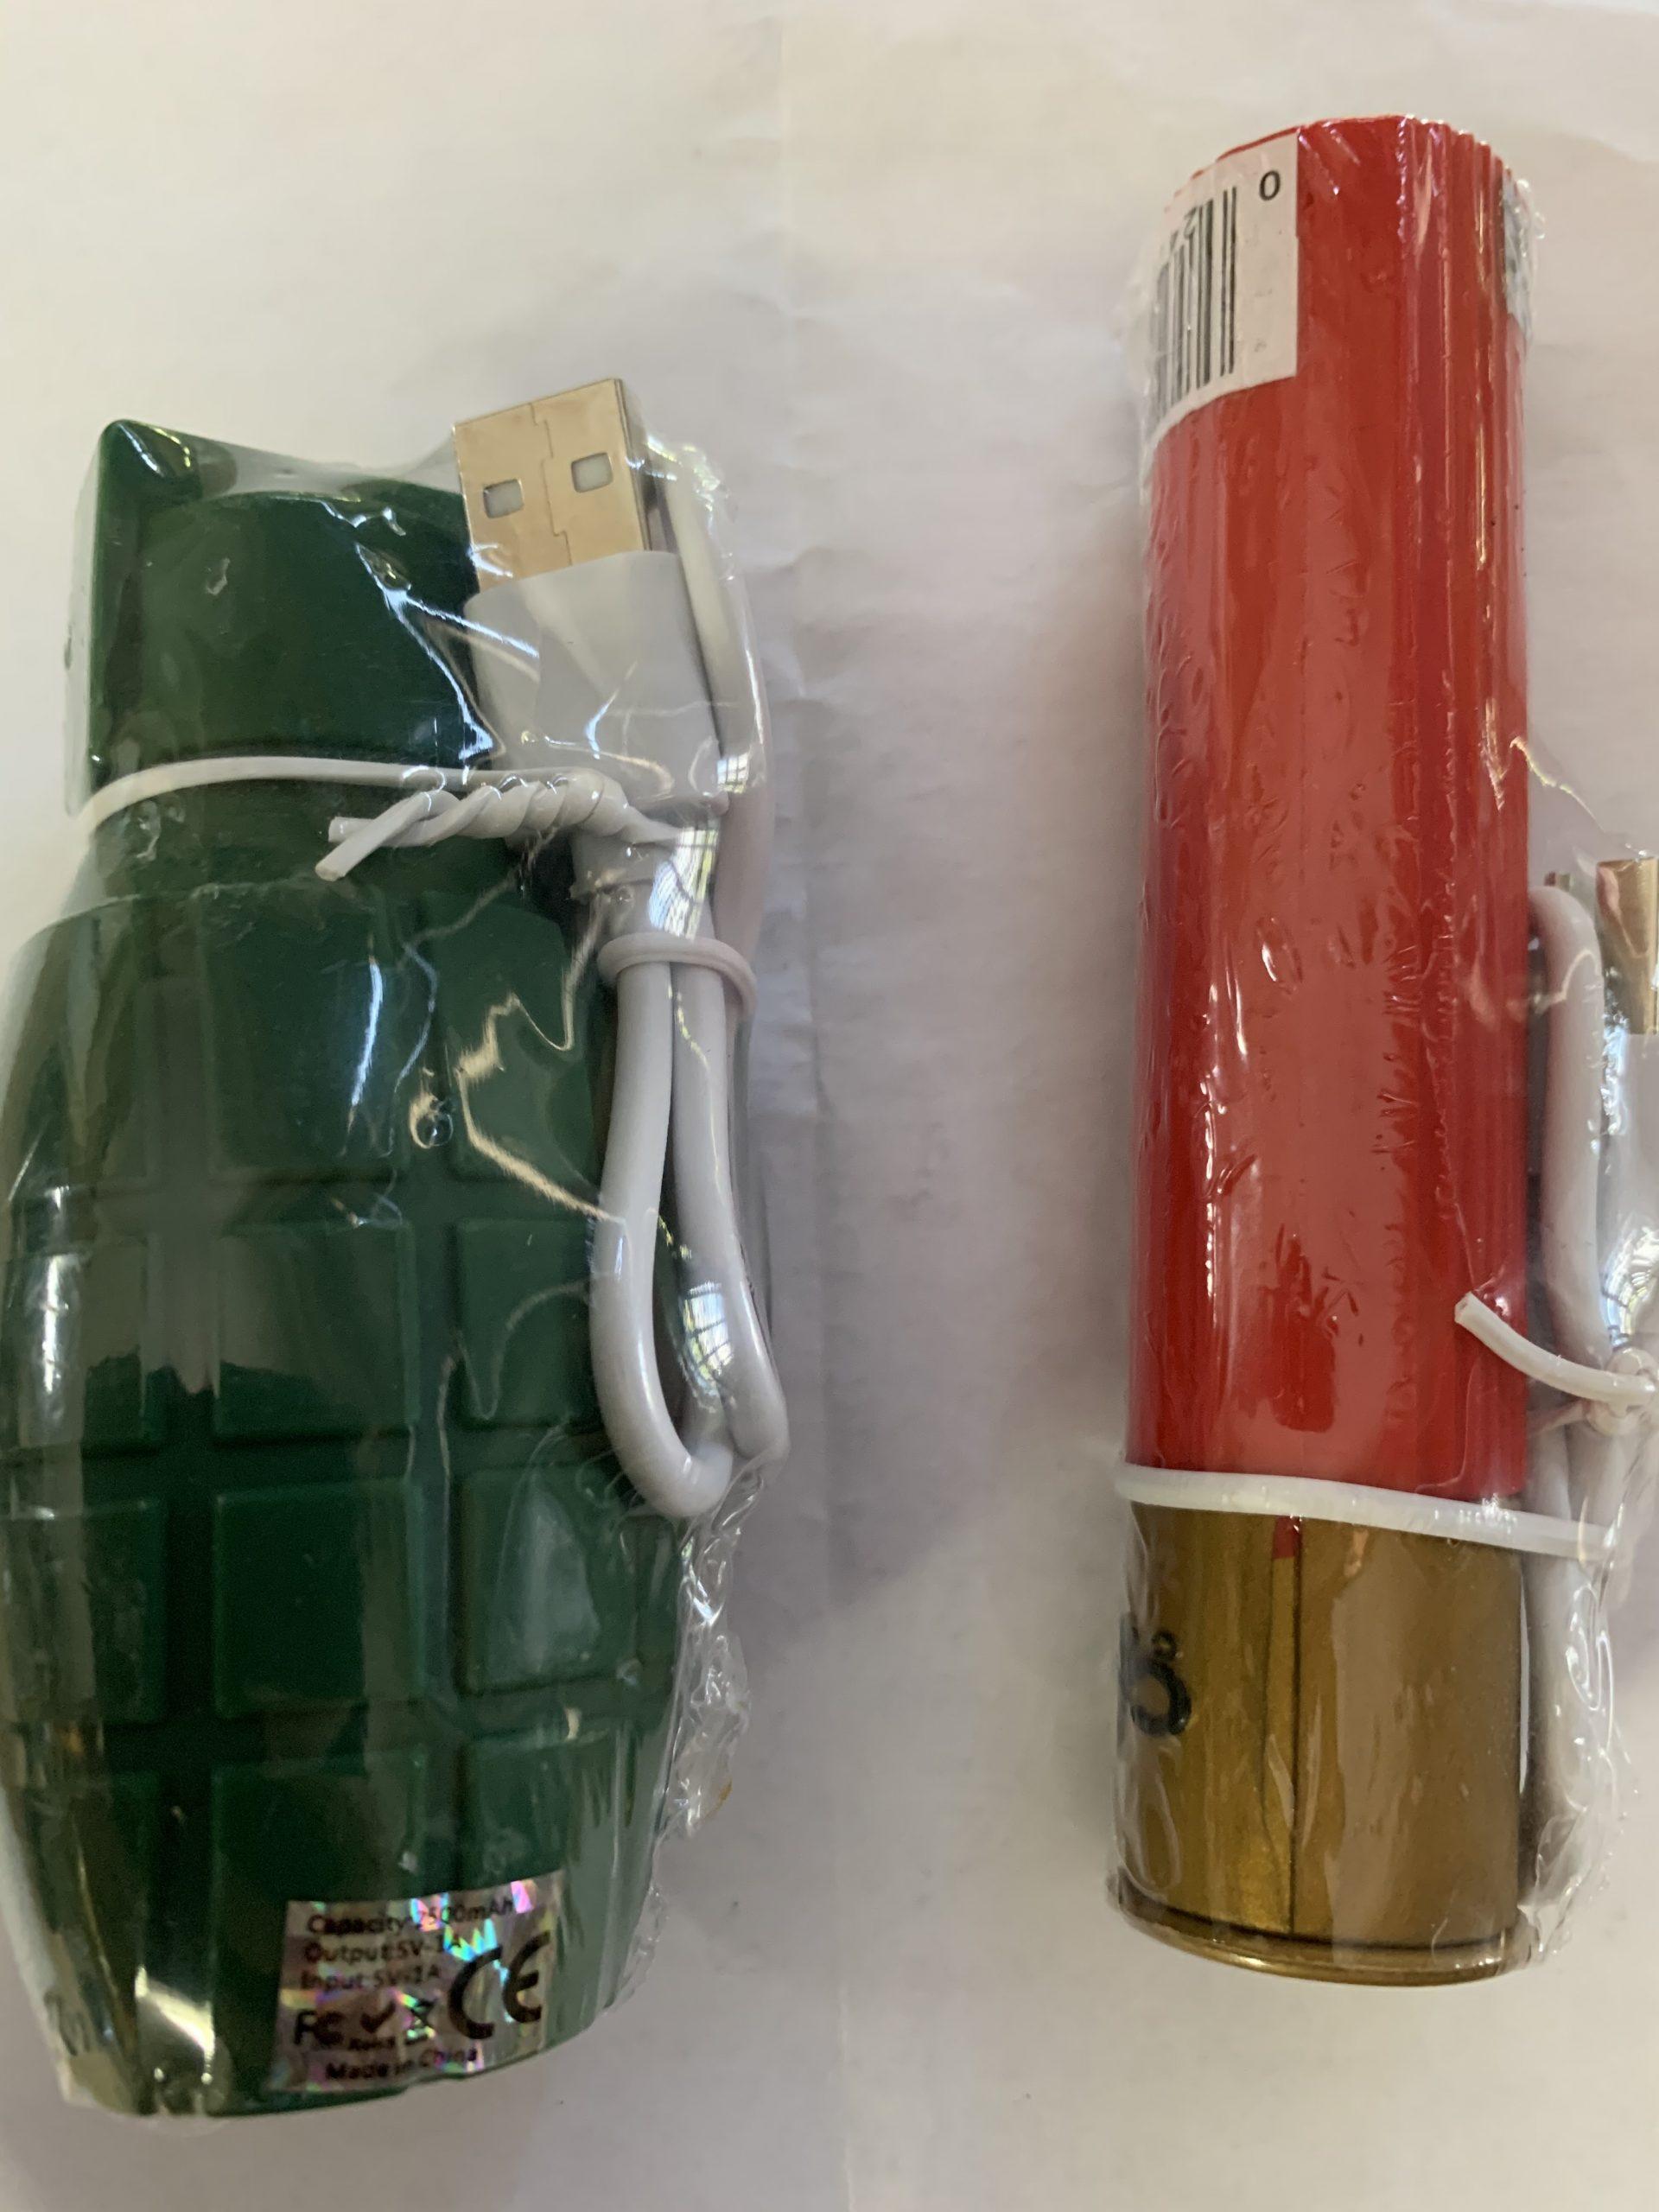 Grenade or Shotshell Powerbank 2500 MAH capacity + cable